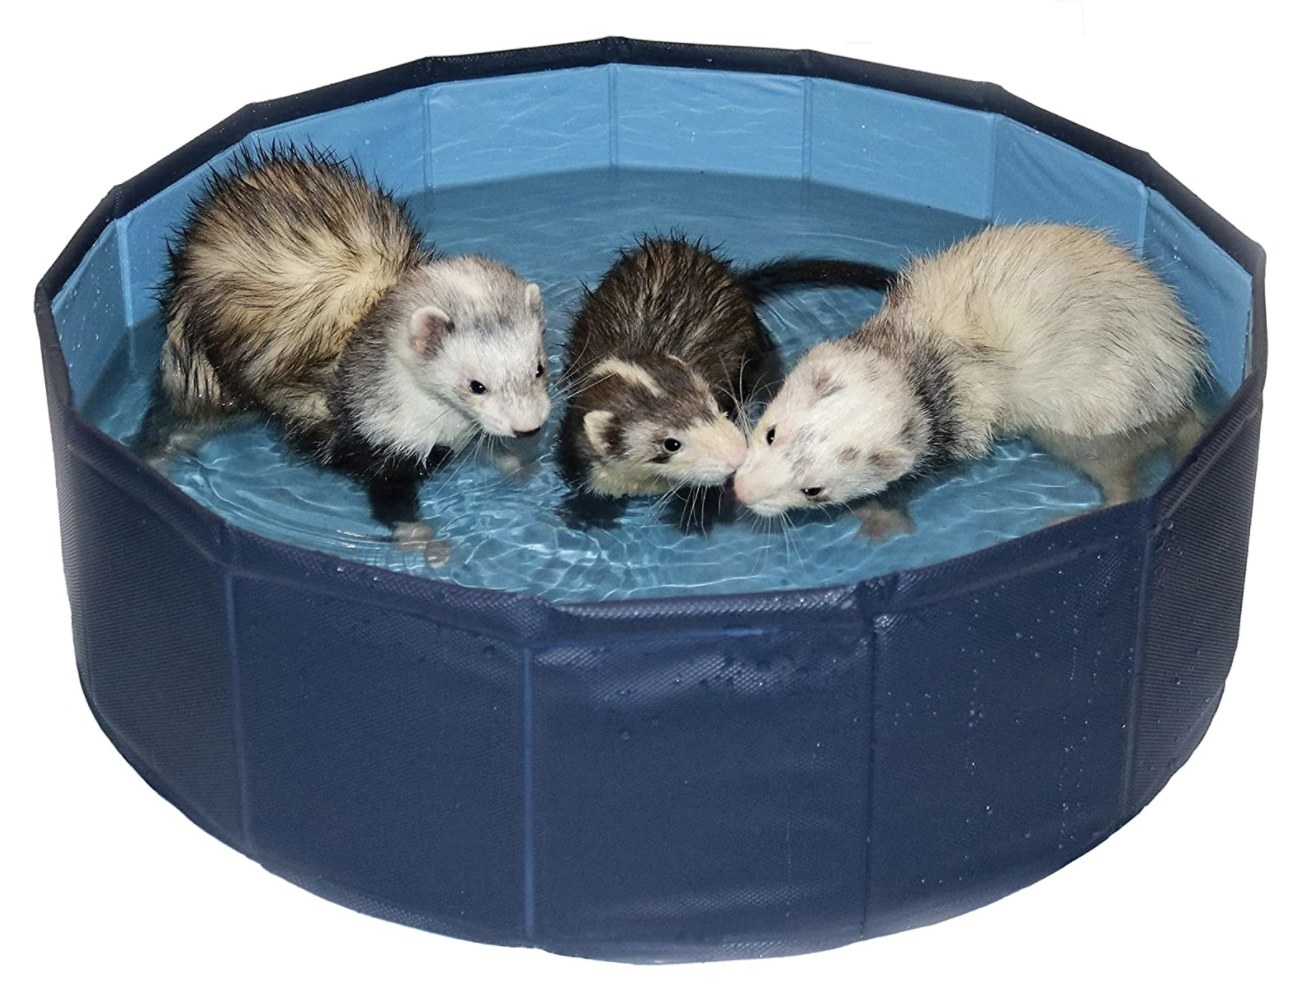 Three wet ferrets inside a round blue swimming pool